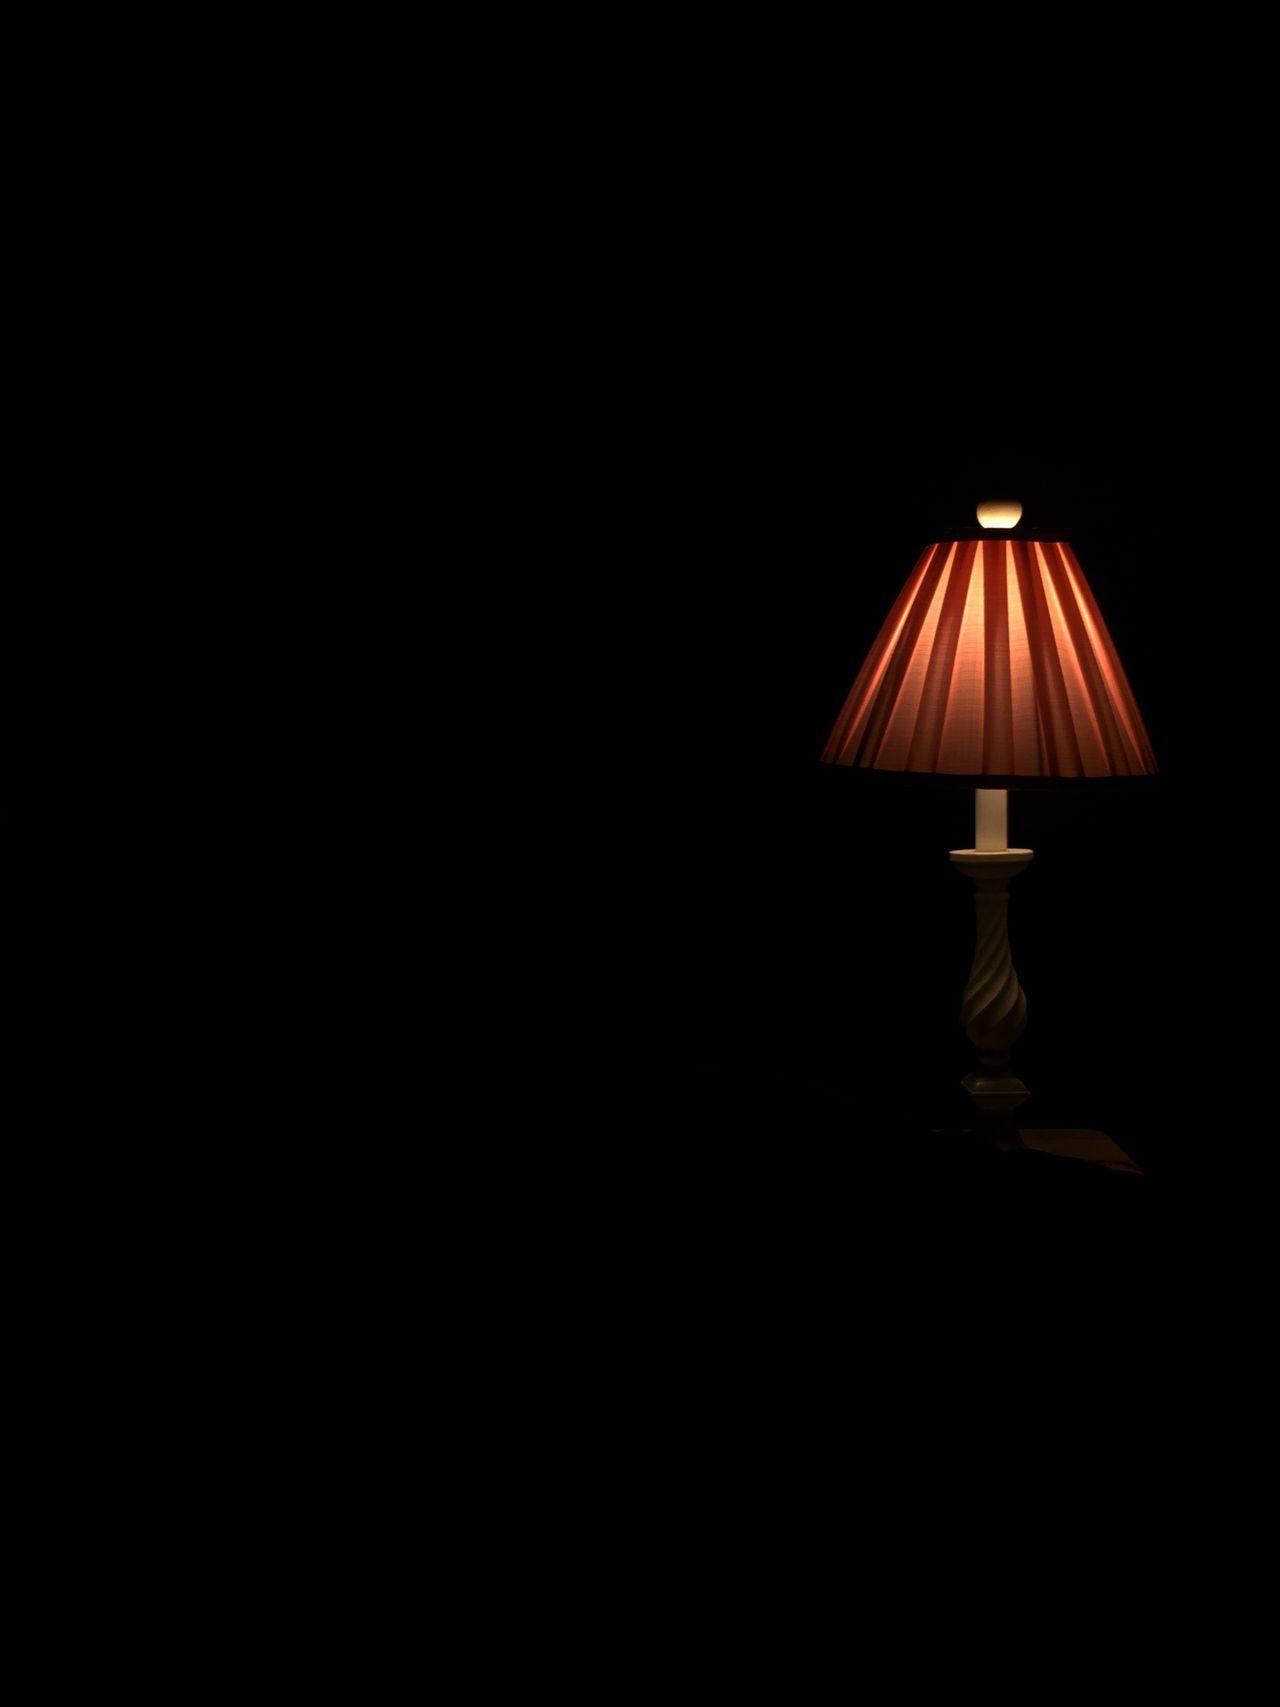 Lamp in the dark. Lamp, Light, Dark, Pink